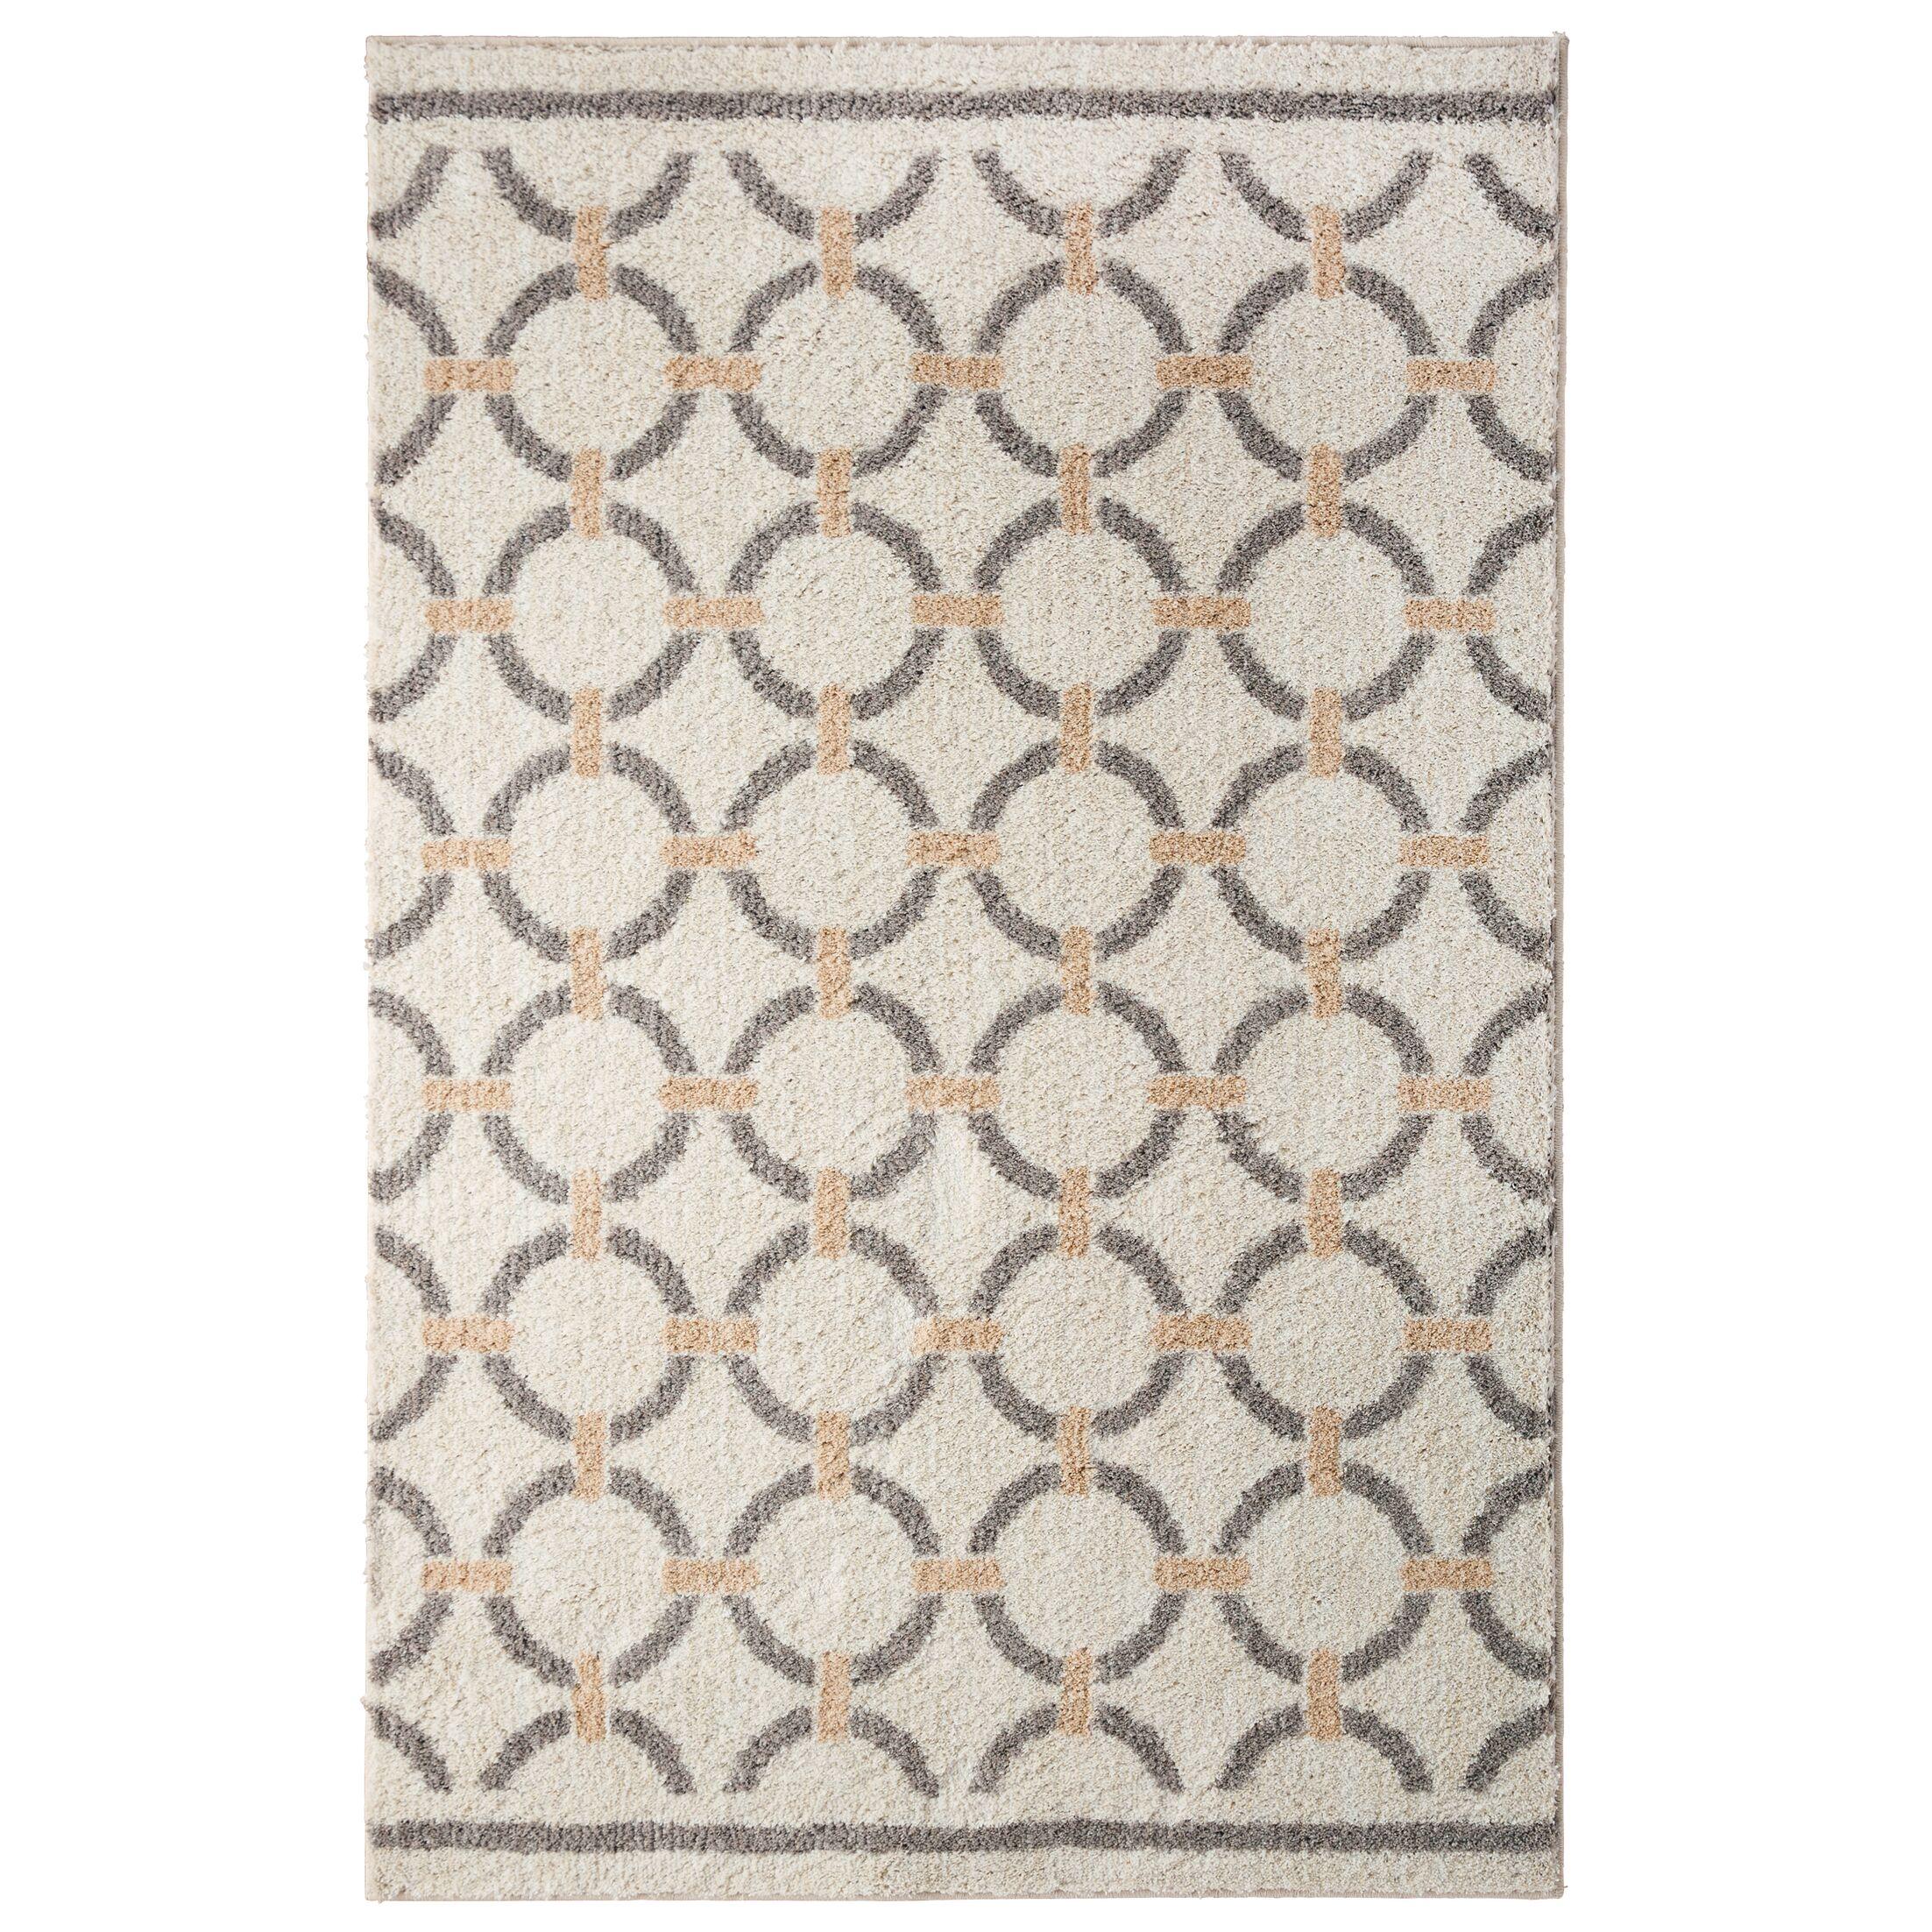 Elmwood Linked Circles Beige/Tan Area Rug Rug Size: Rectangle 5' x 7'